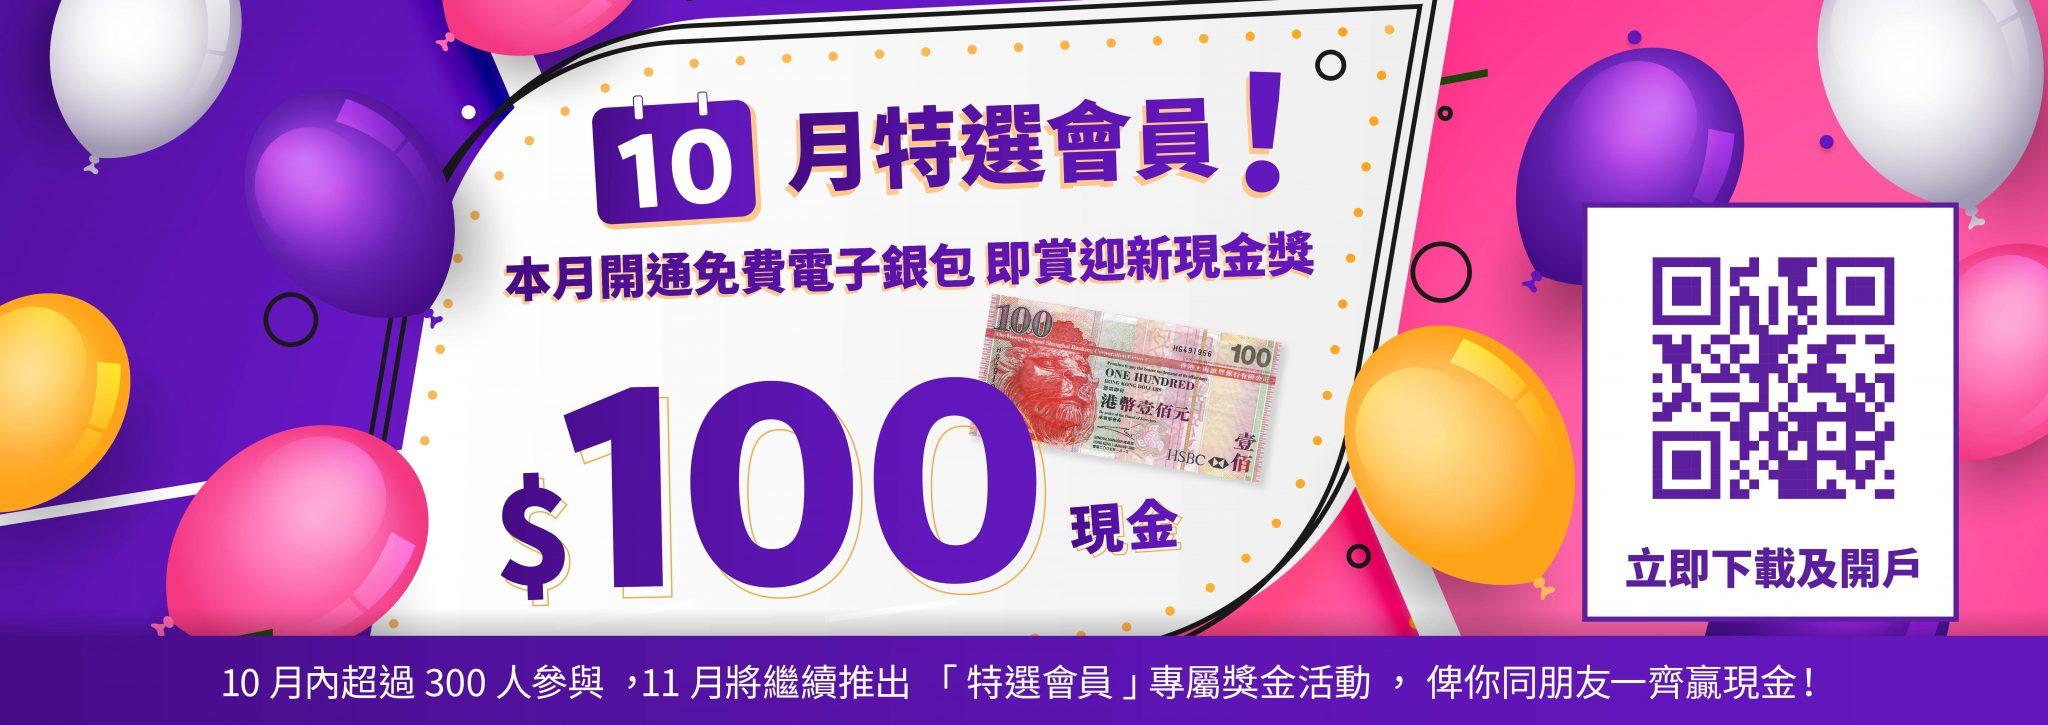 Zwap Wallet - oct100